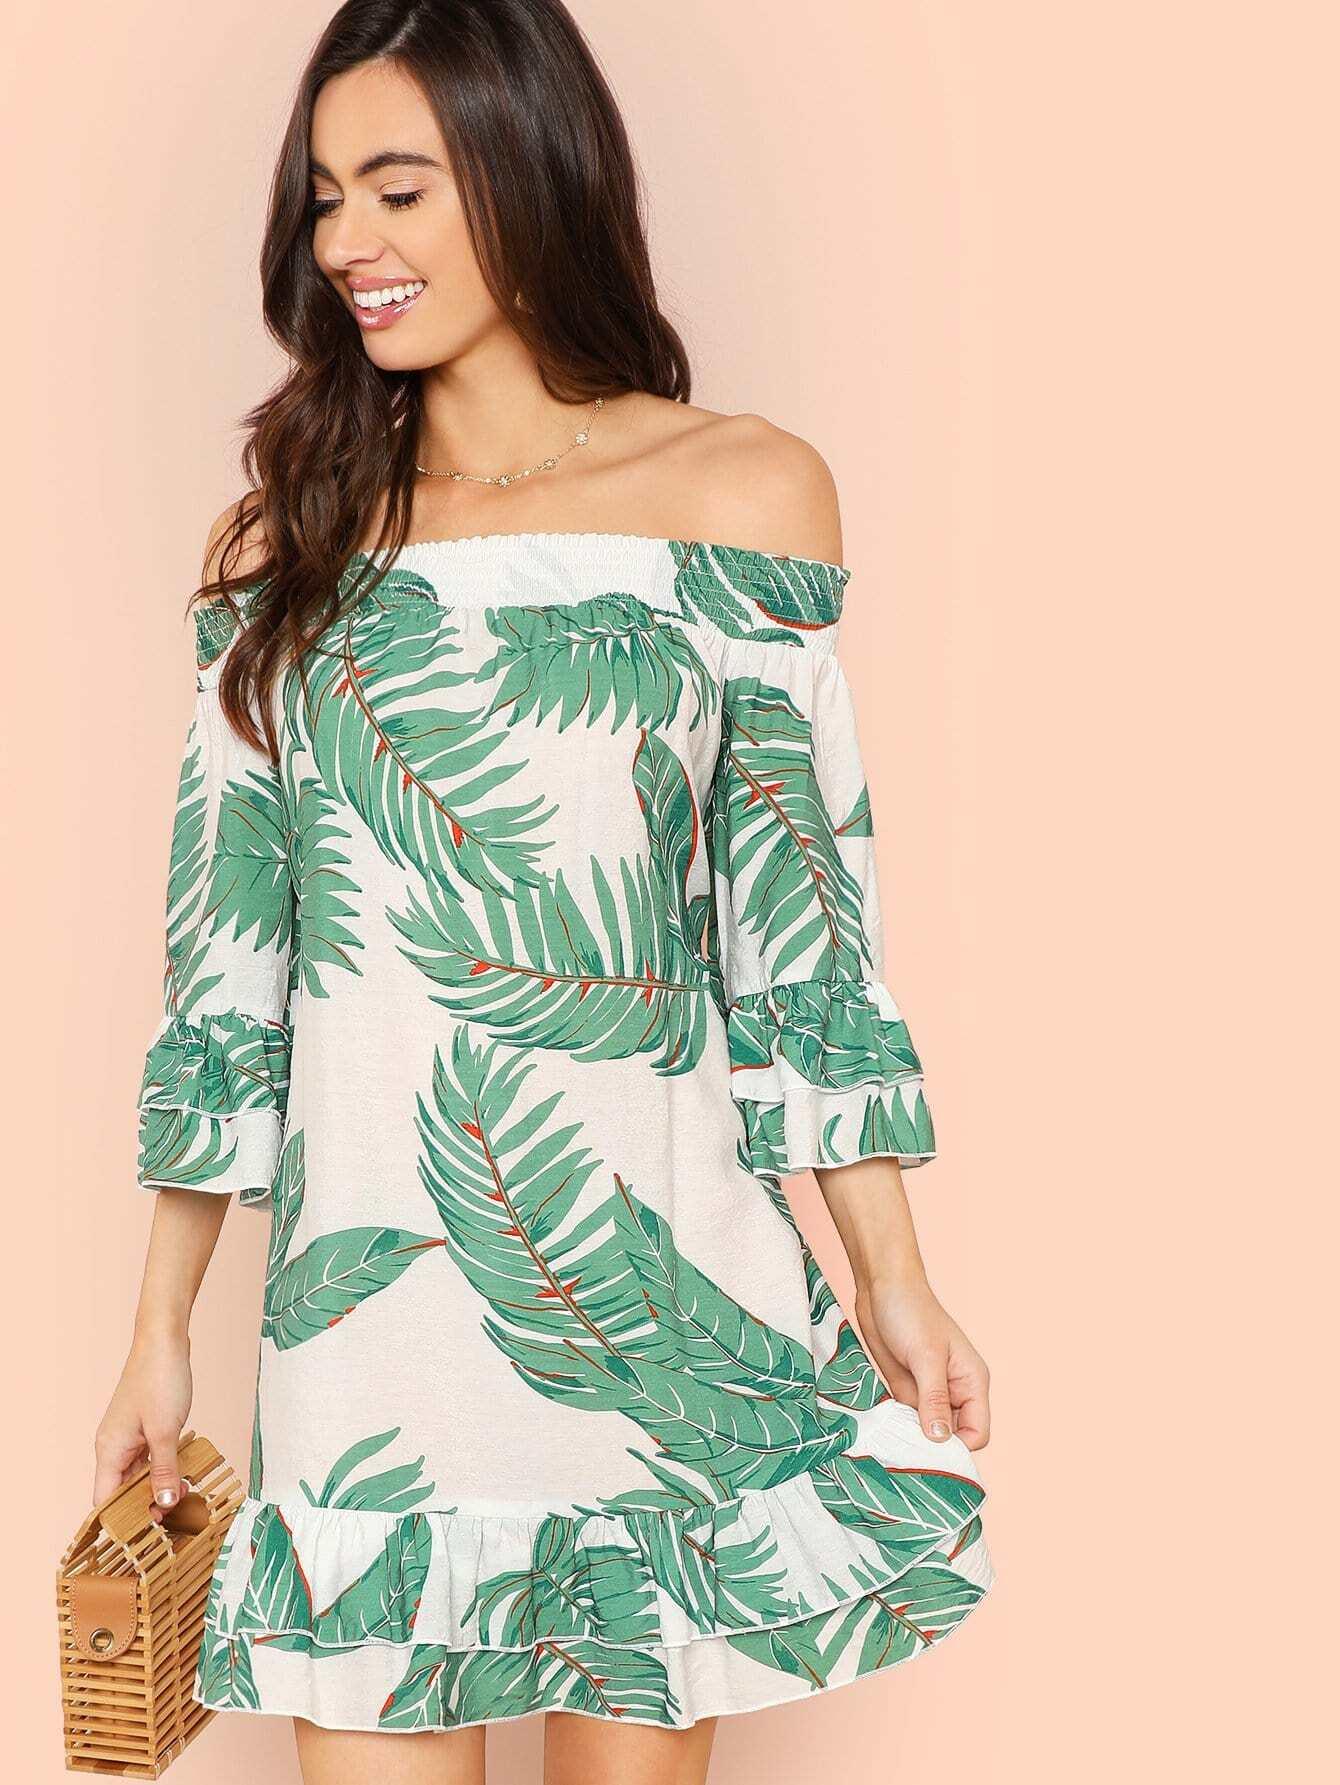 Shirred Off Shoulder Layered Ruffle Trim Tropical Dress layered ruffle trim satin wrap dress